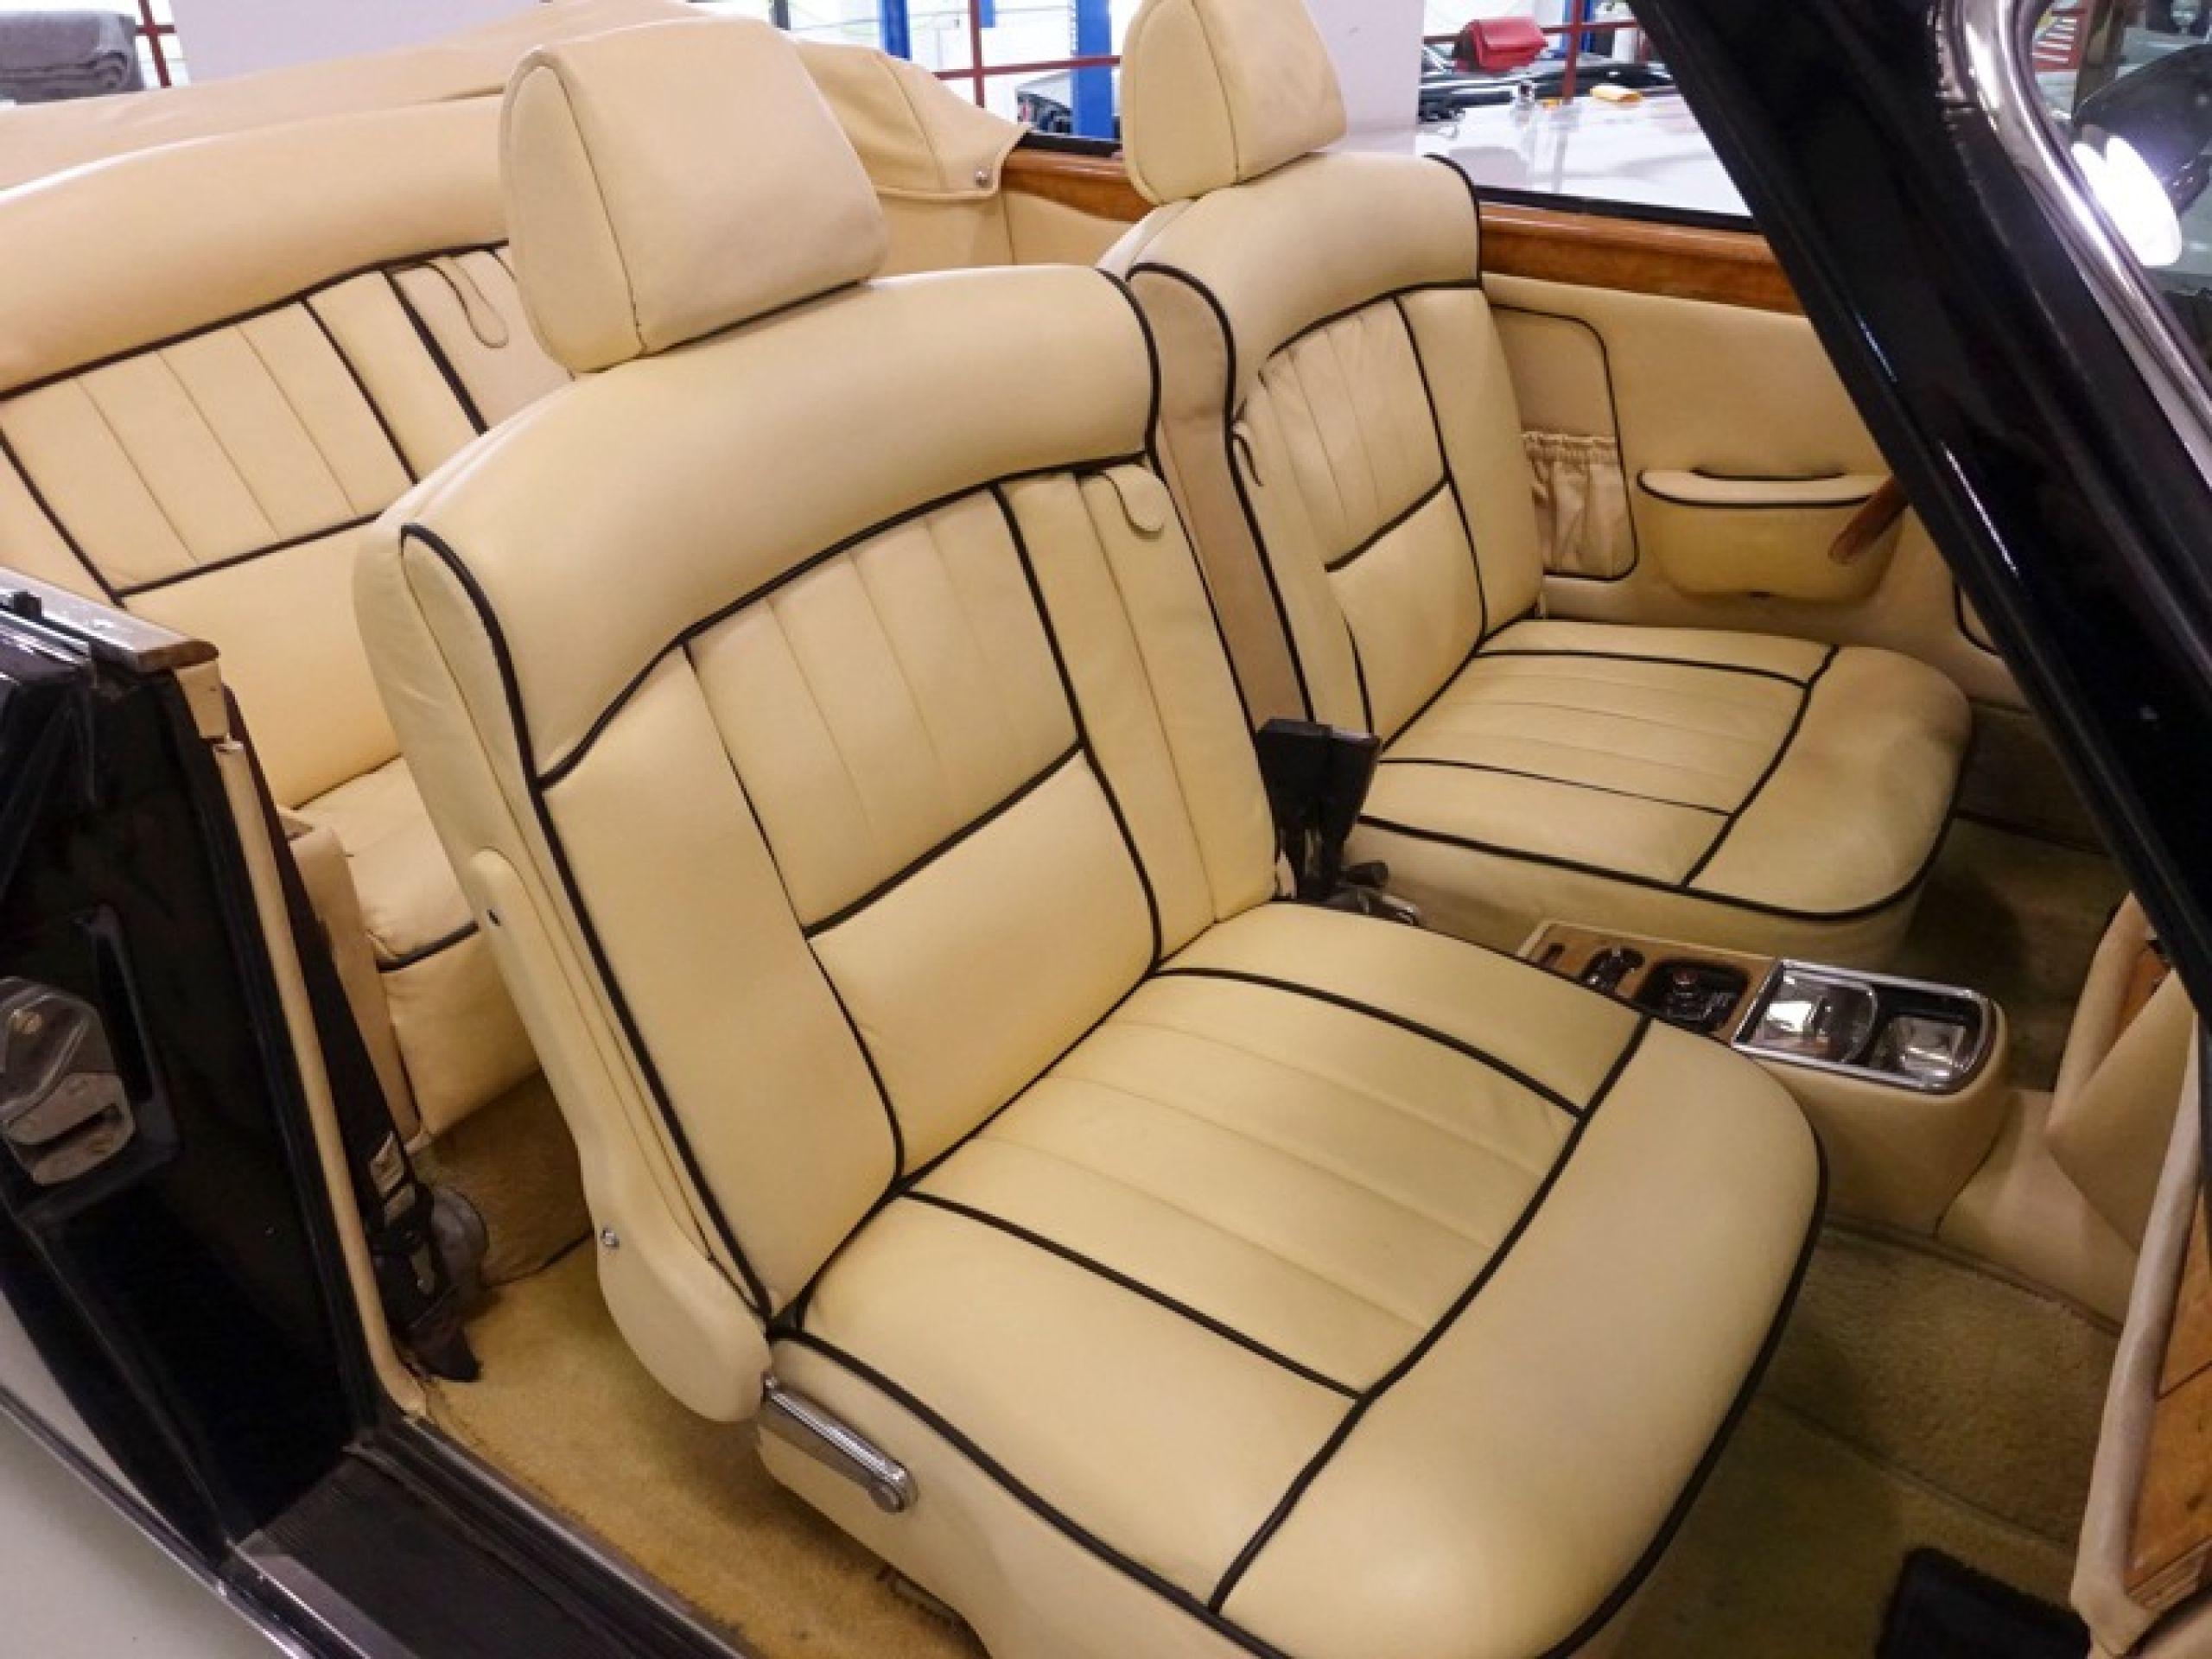 1974 Rolls-Royce Corniche Convertible